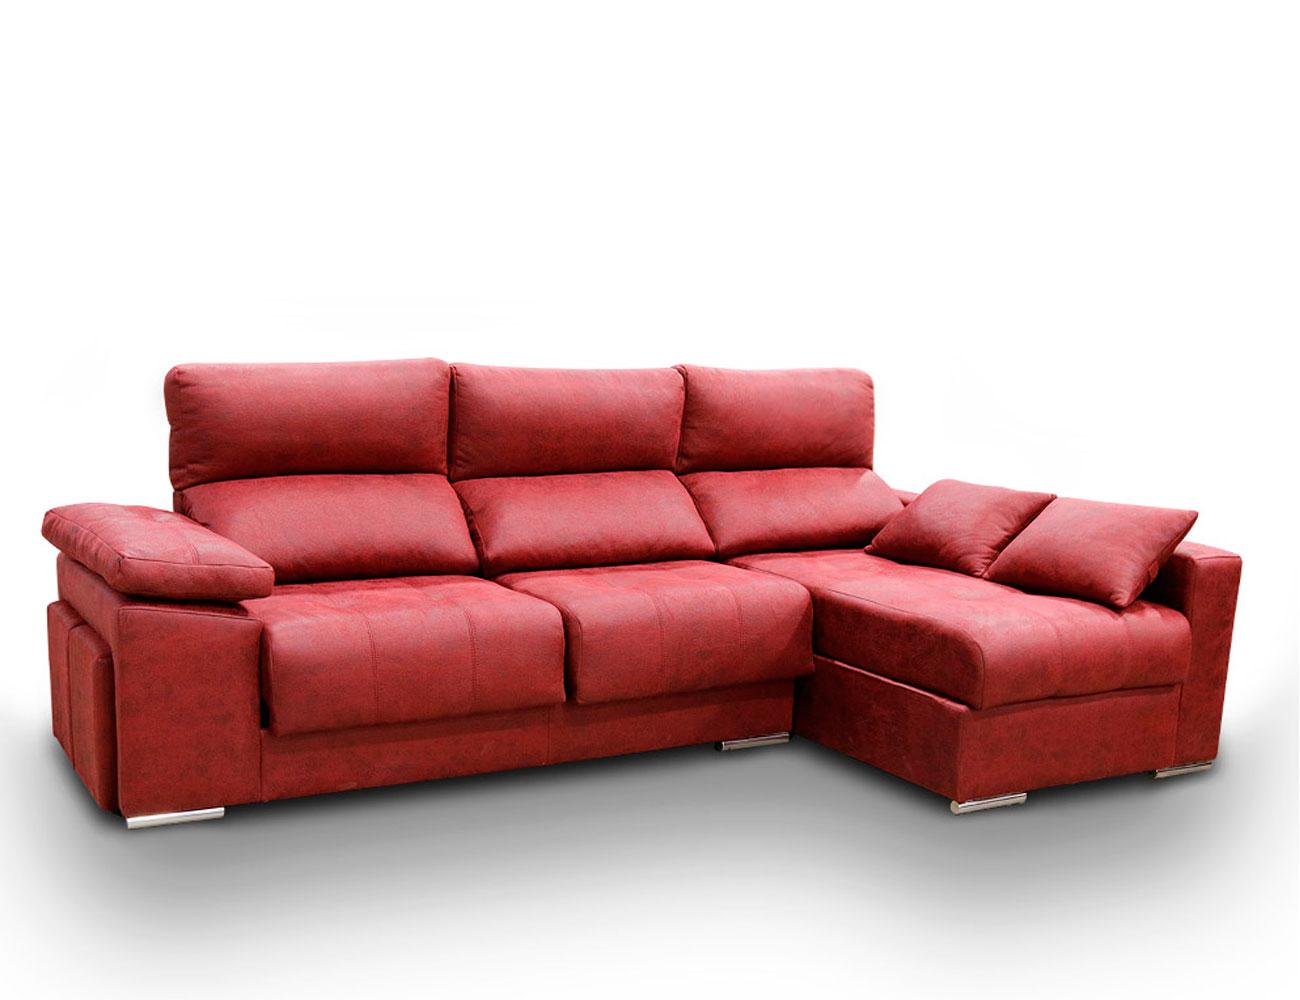 Sofa chaiselongue anti manchas rojo granate17